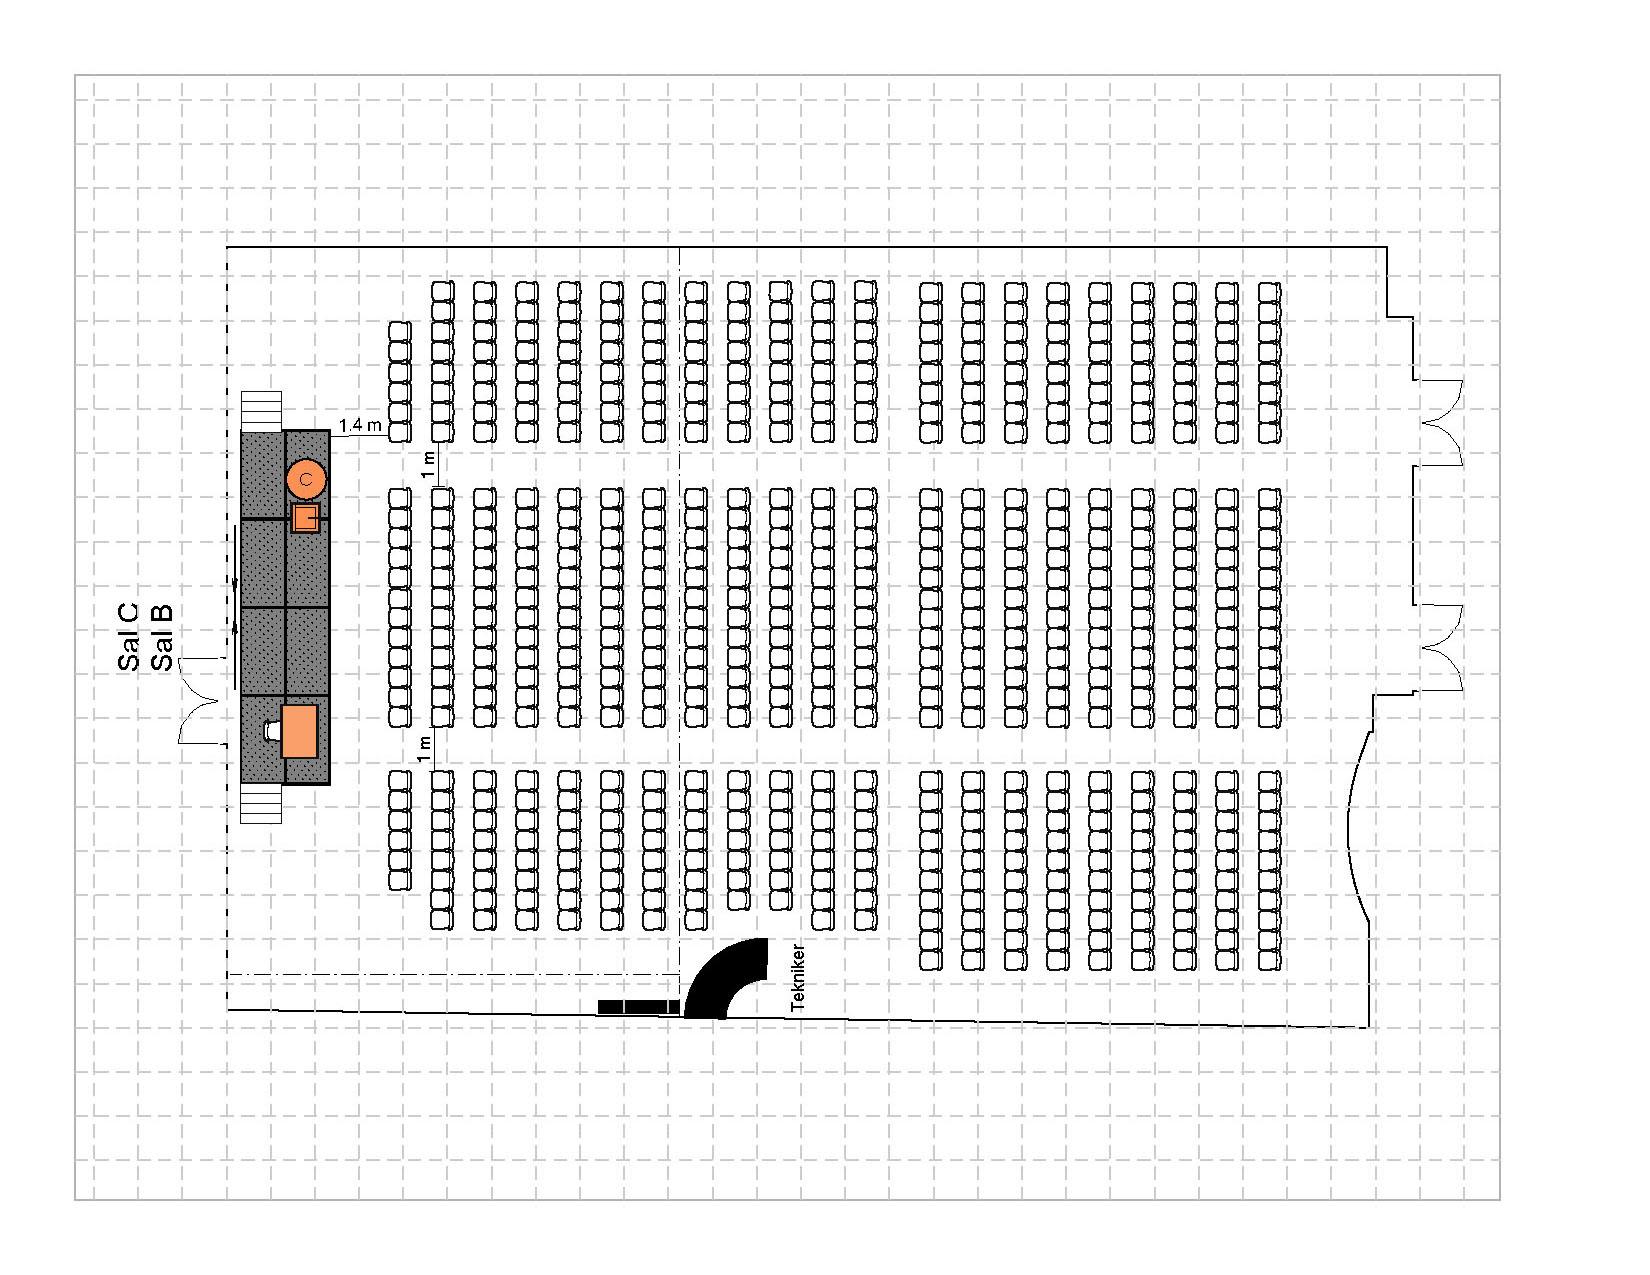 Kino 600 plasser